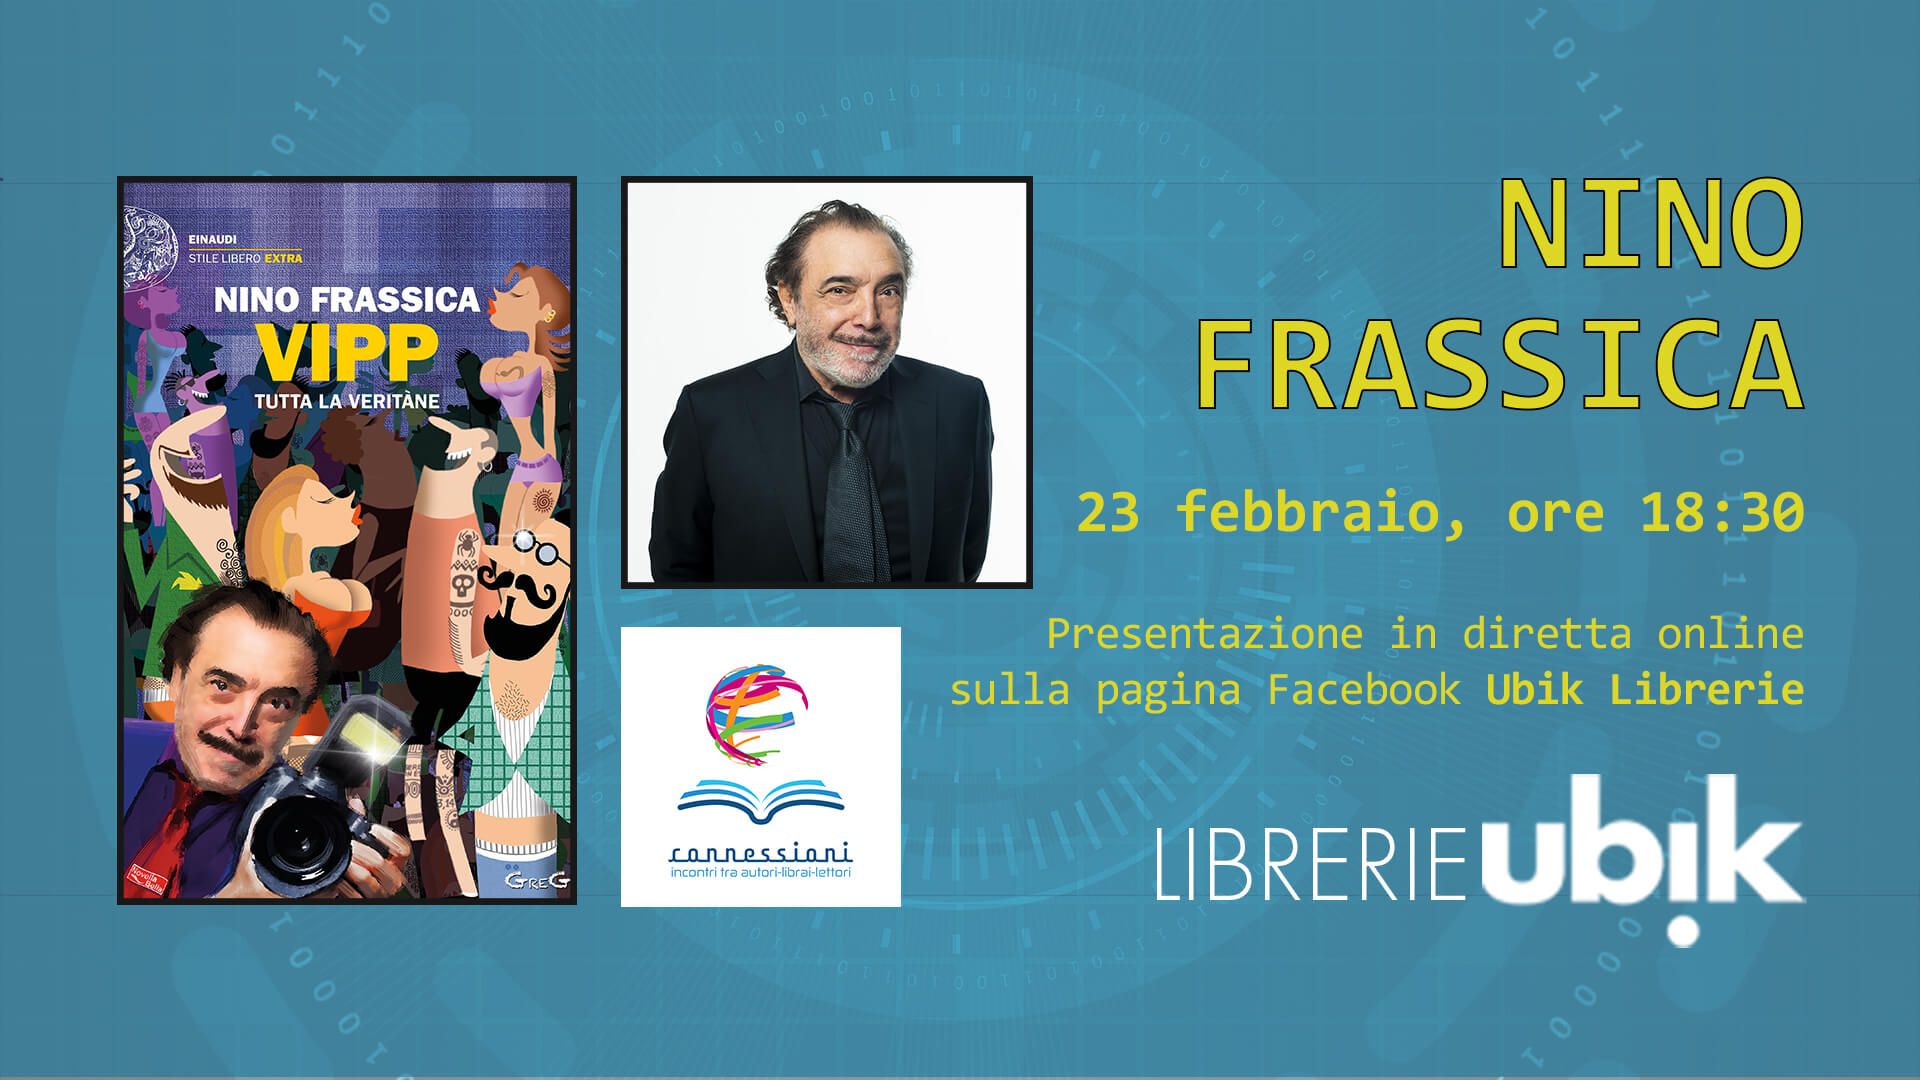 NINO FRASSICA presenta in diretta online